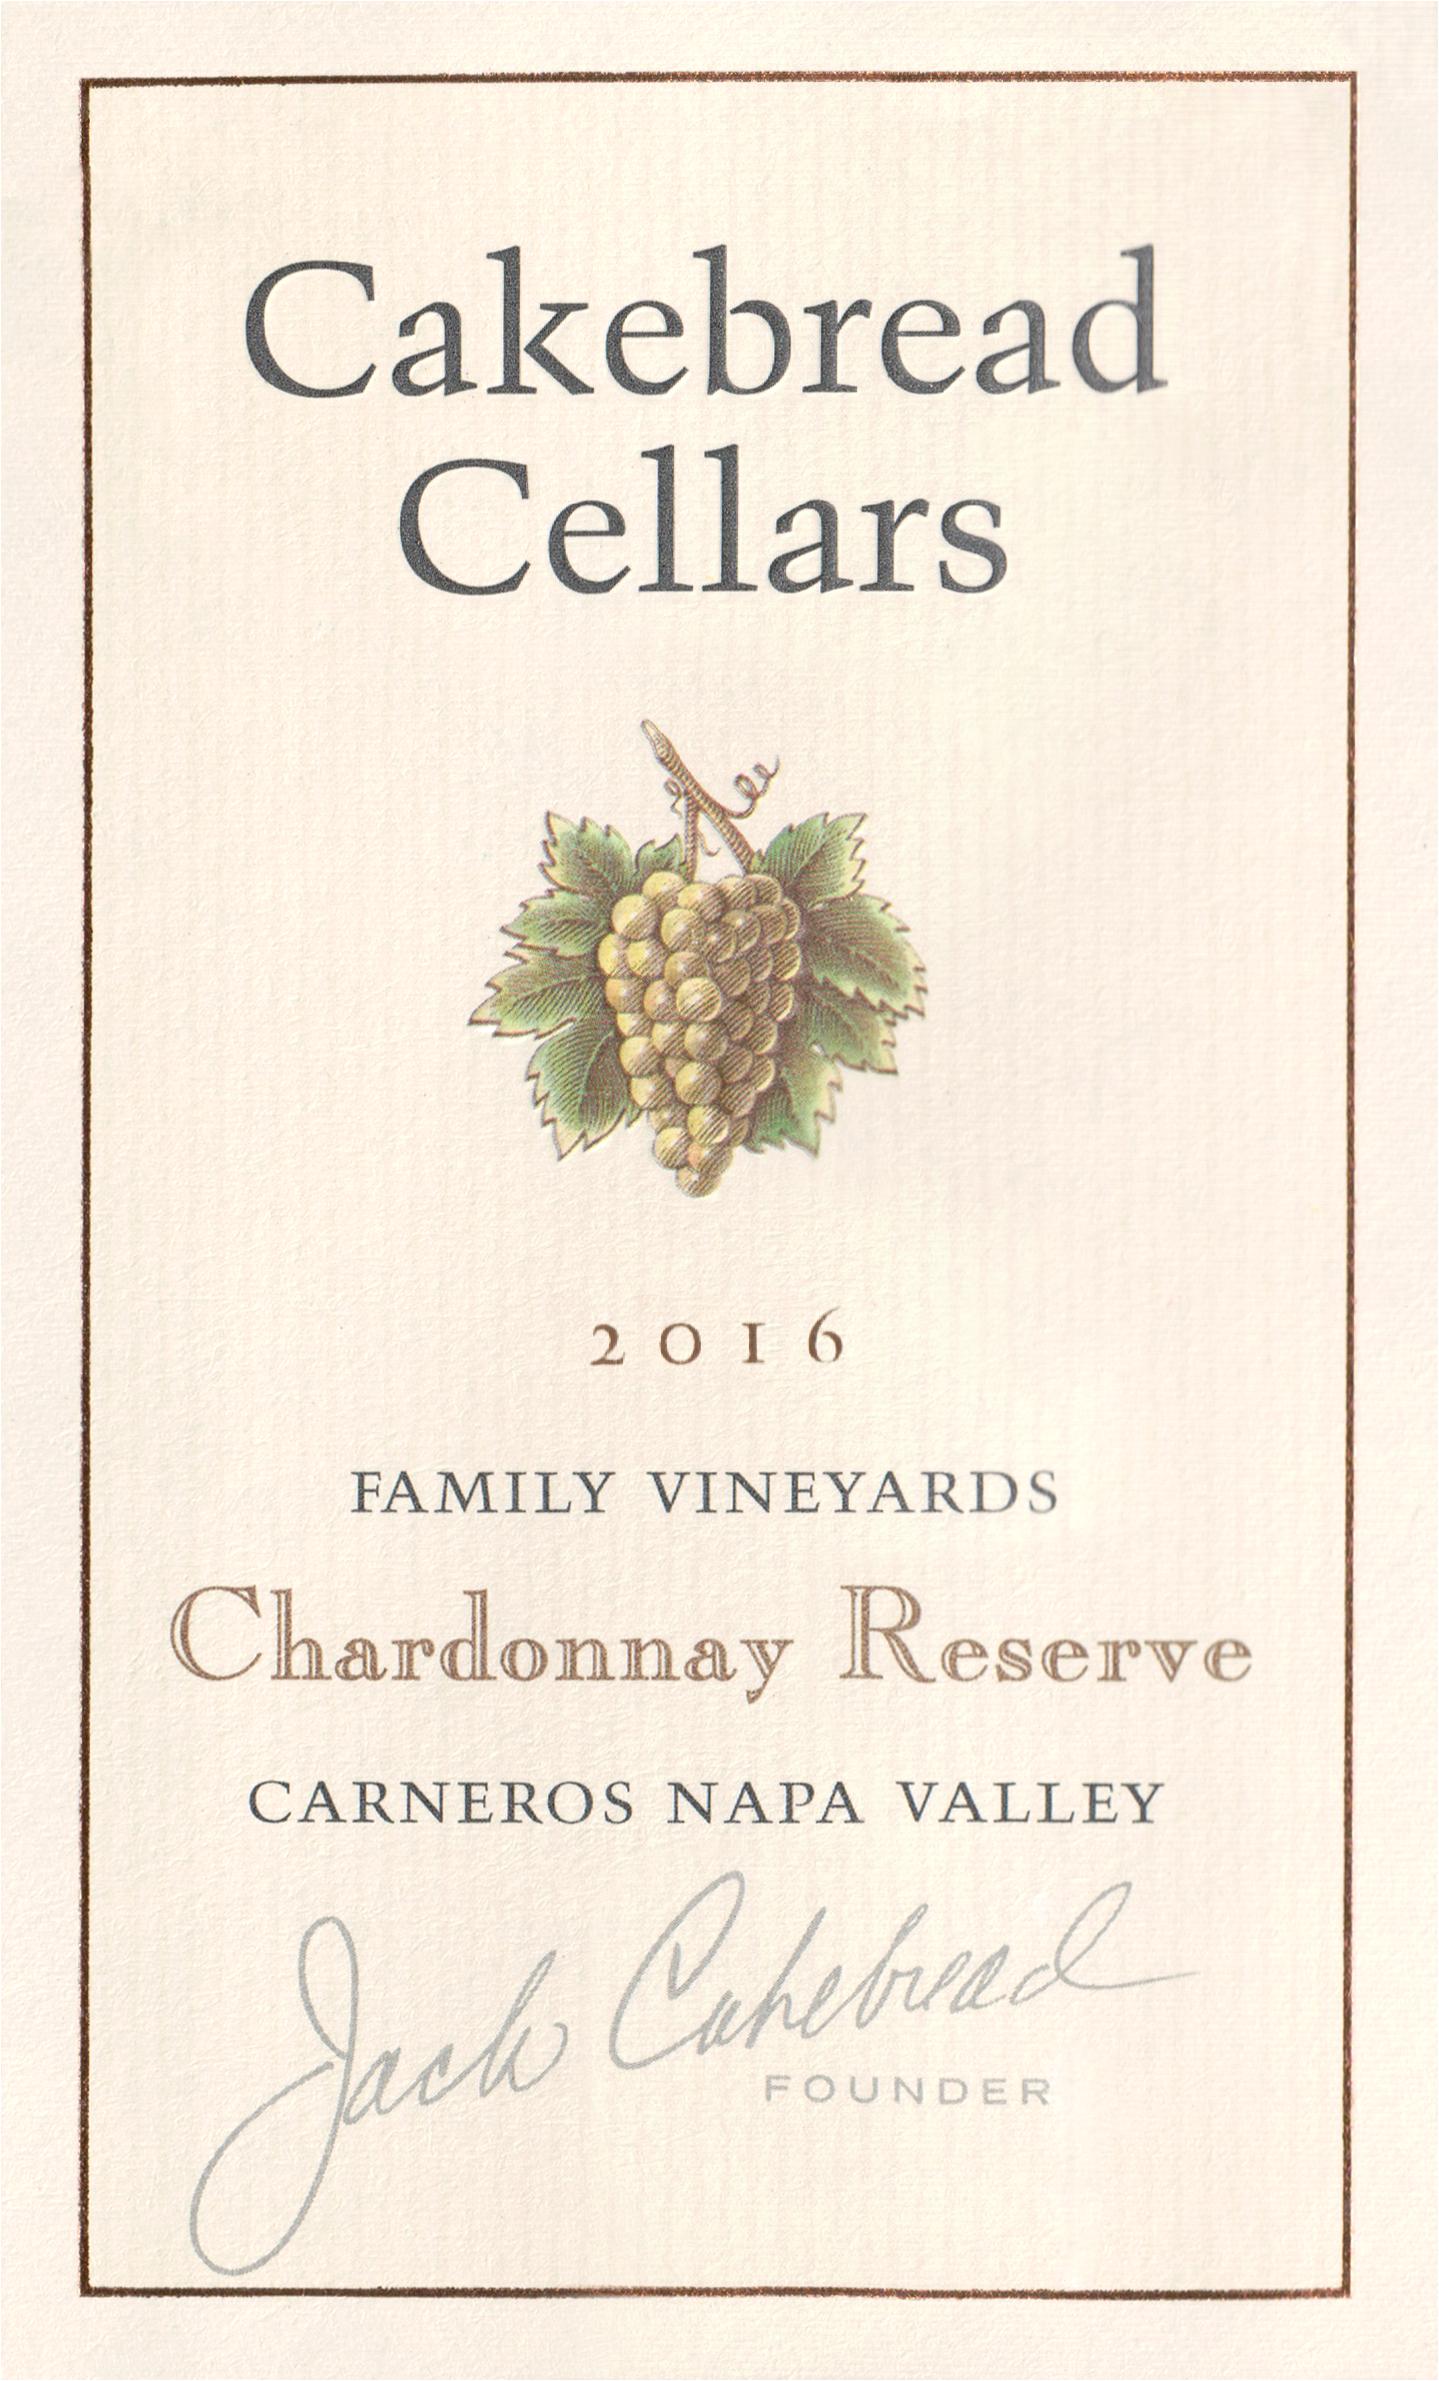 Cakebread Chardonnay Reserve 2016